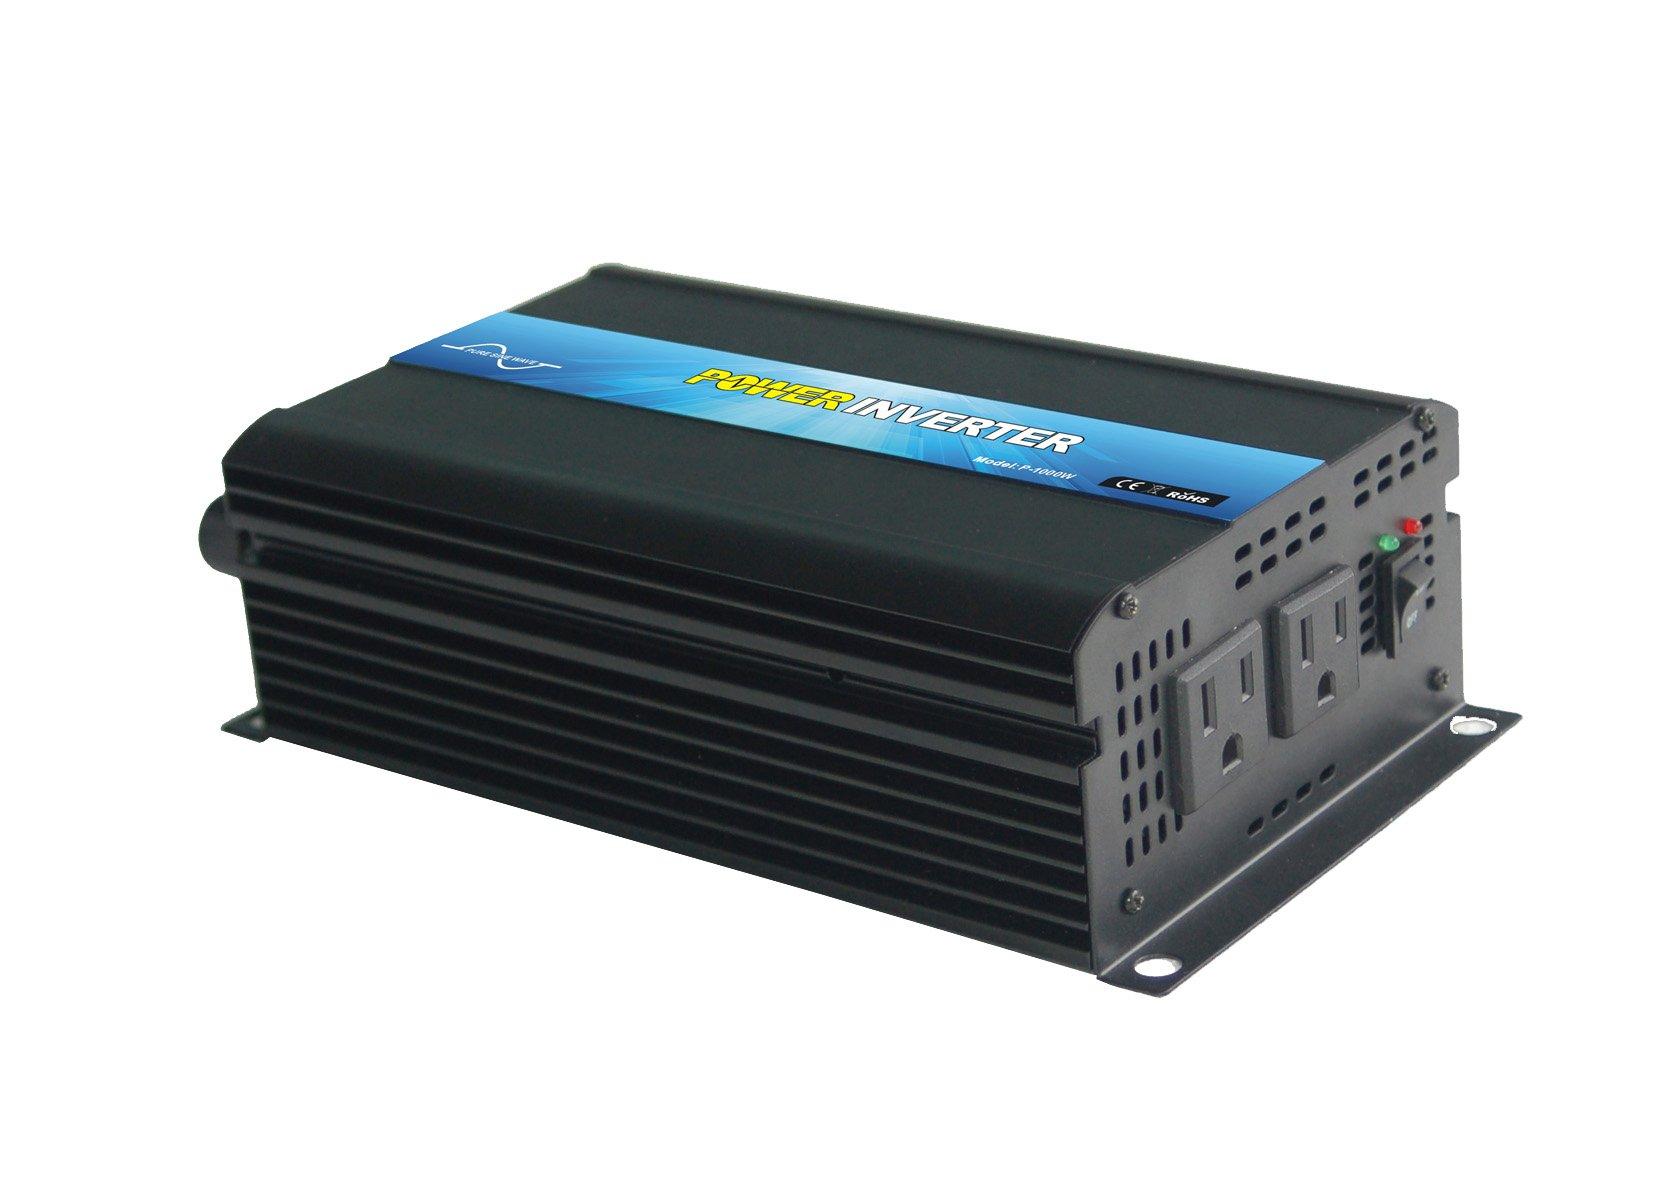 NIMTEK NL1000 Pure Sine Wave Off-grid Inverter, Solar Inverter 1000 Watt 48 Volt DC To 110 Volt AC